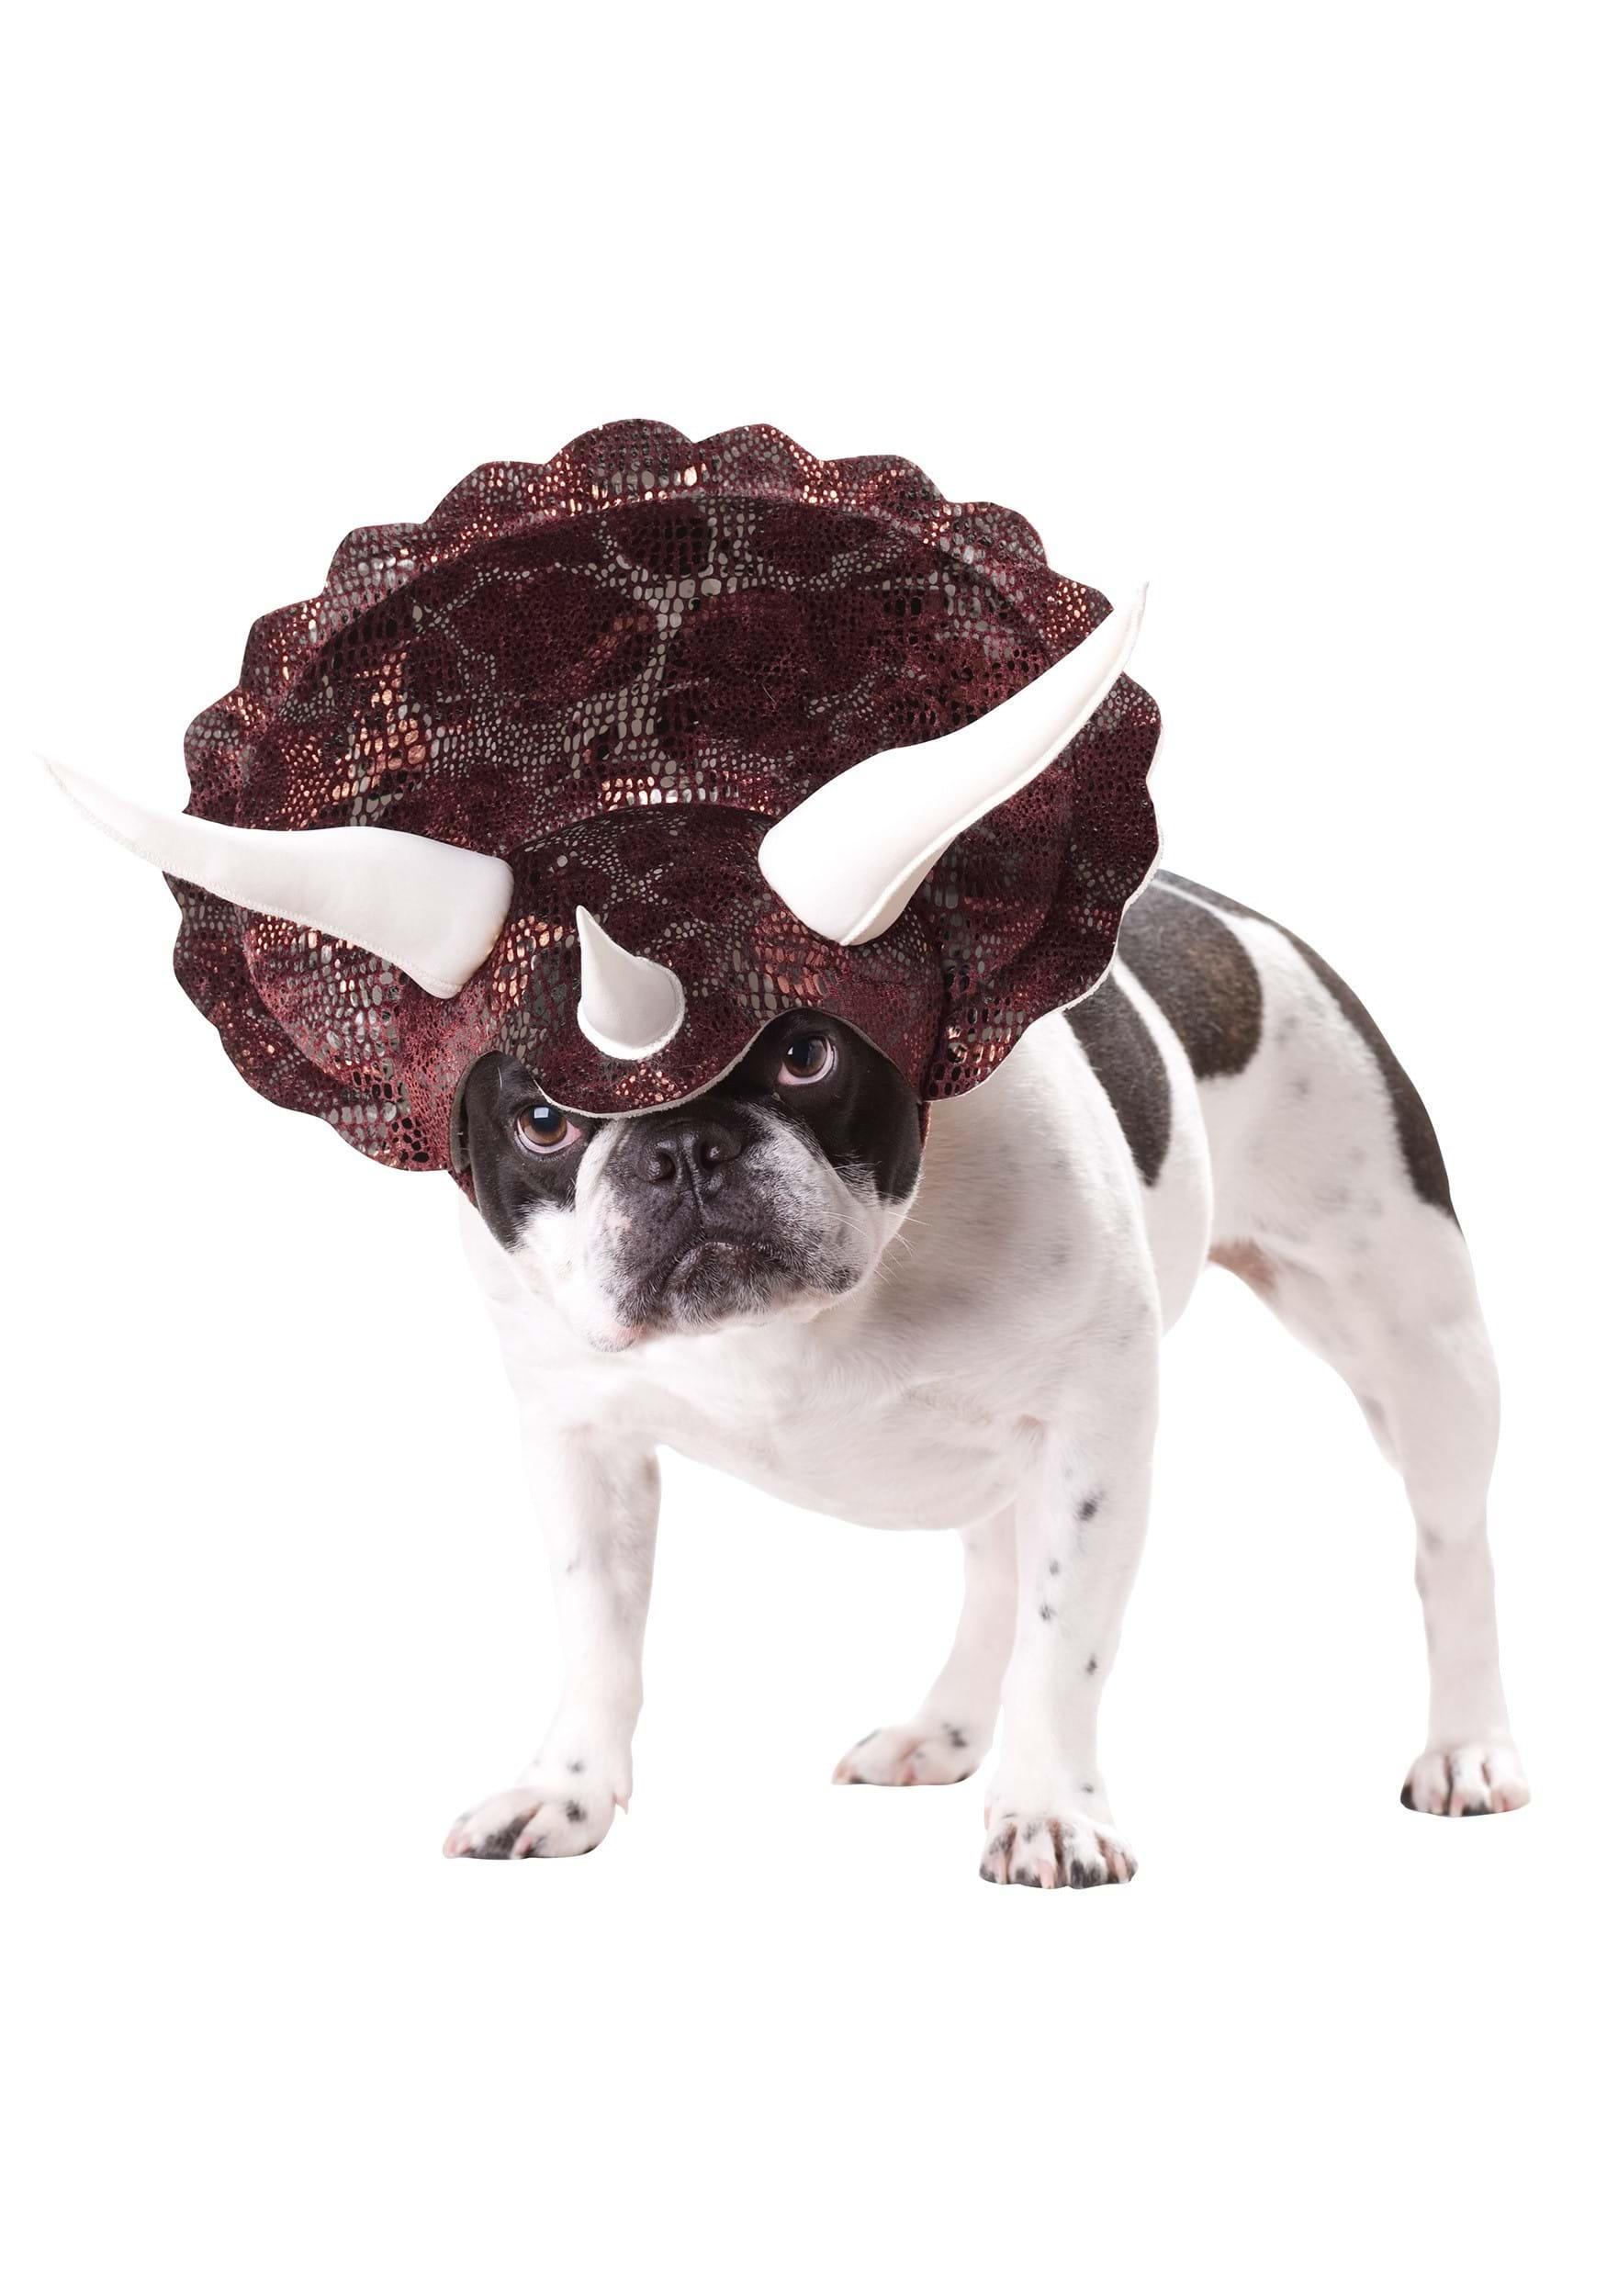 Superhero Dog Costumes Funny Pet Halloween Fancy Dress | eBay |Pet Halloween Coustumes